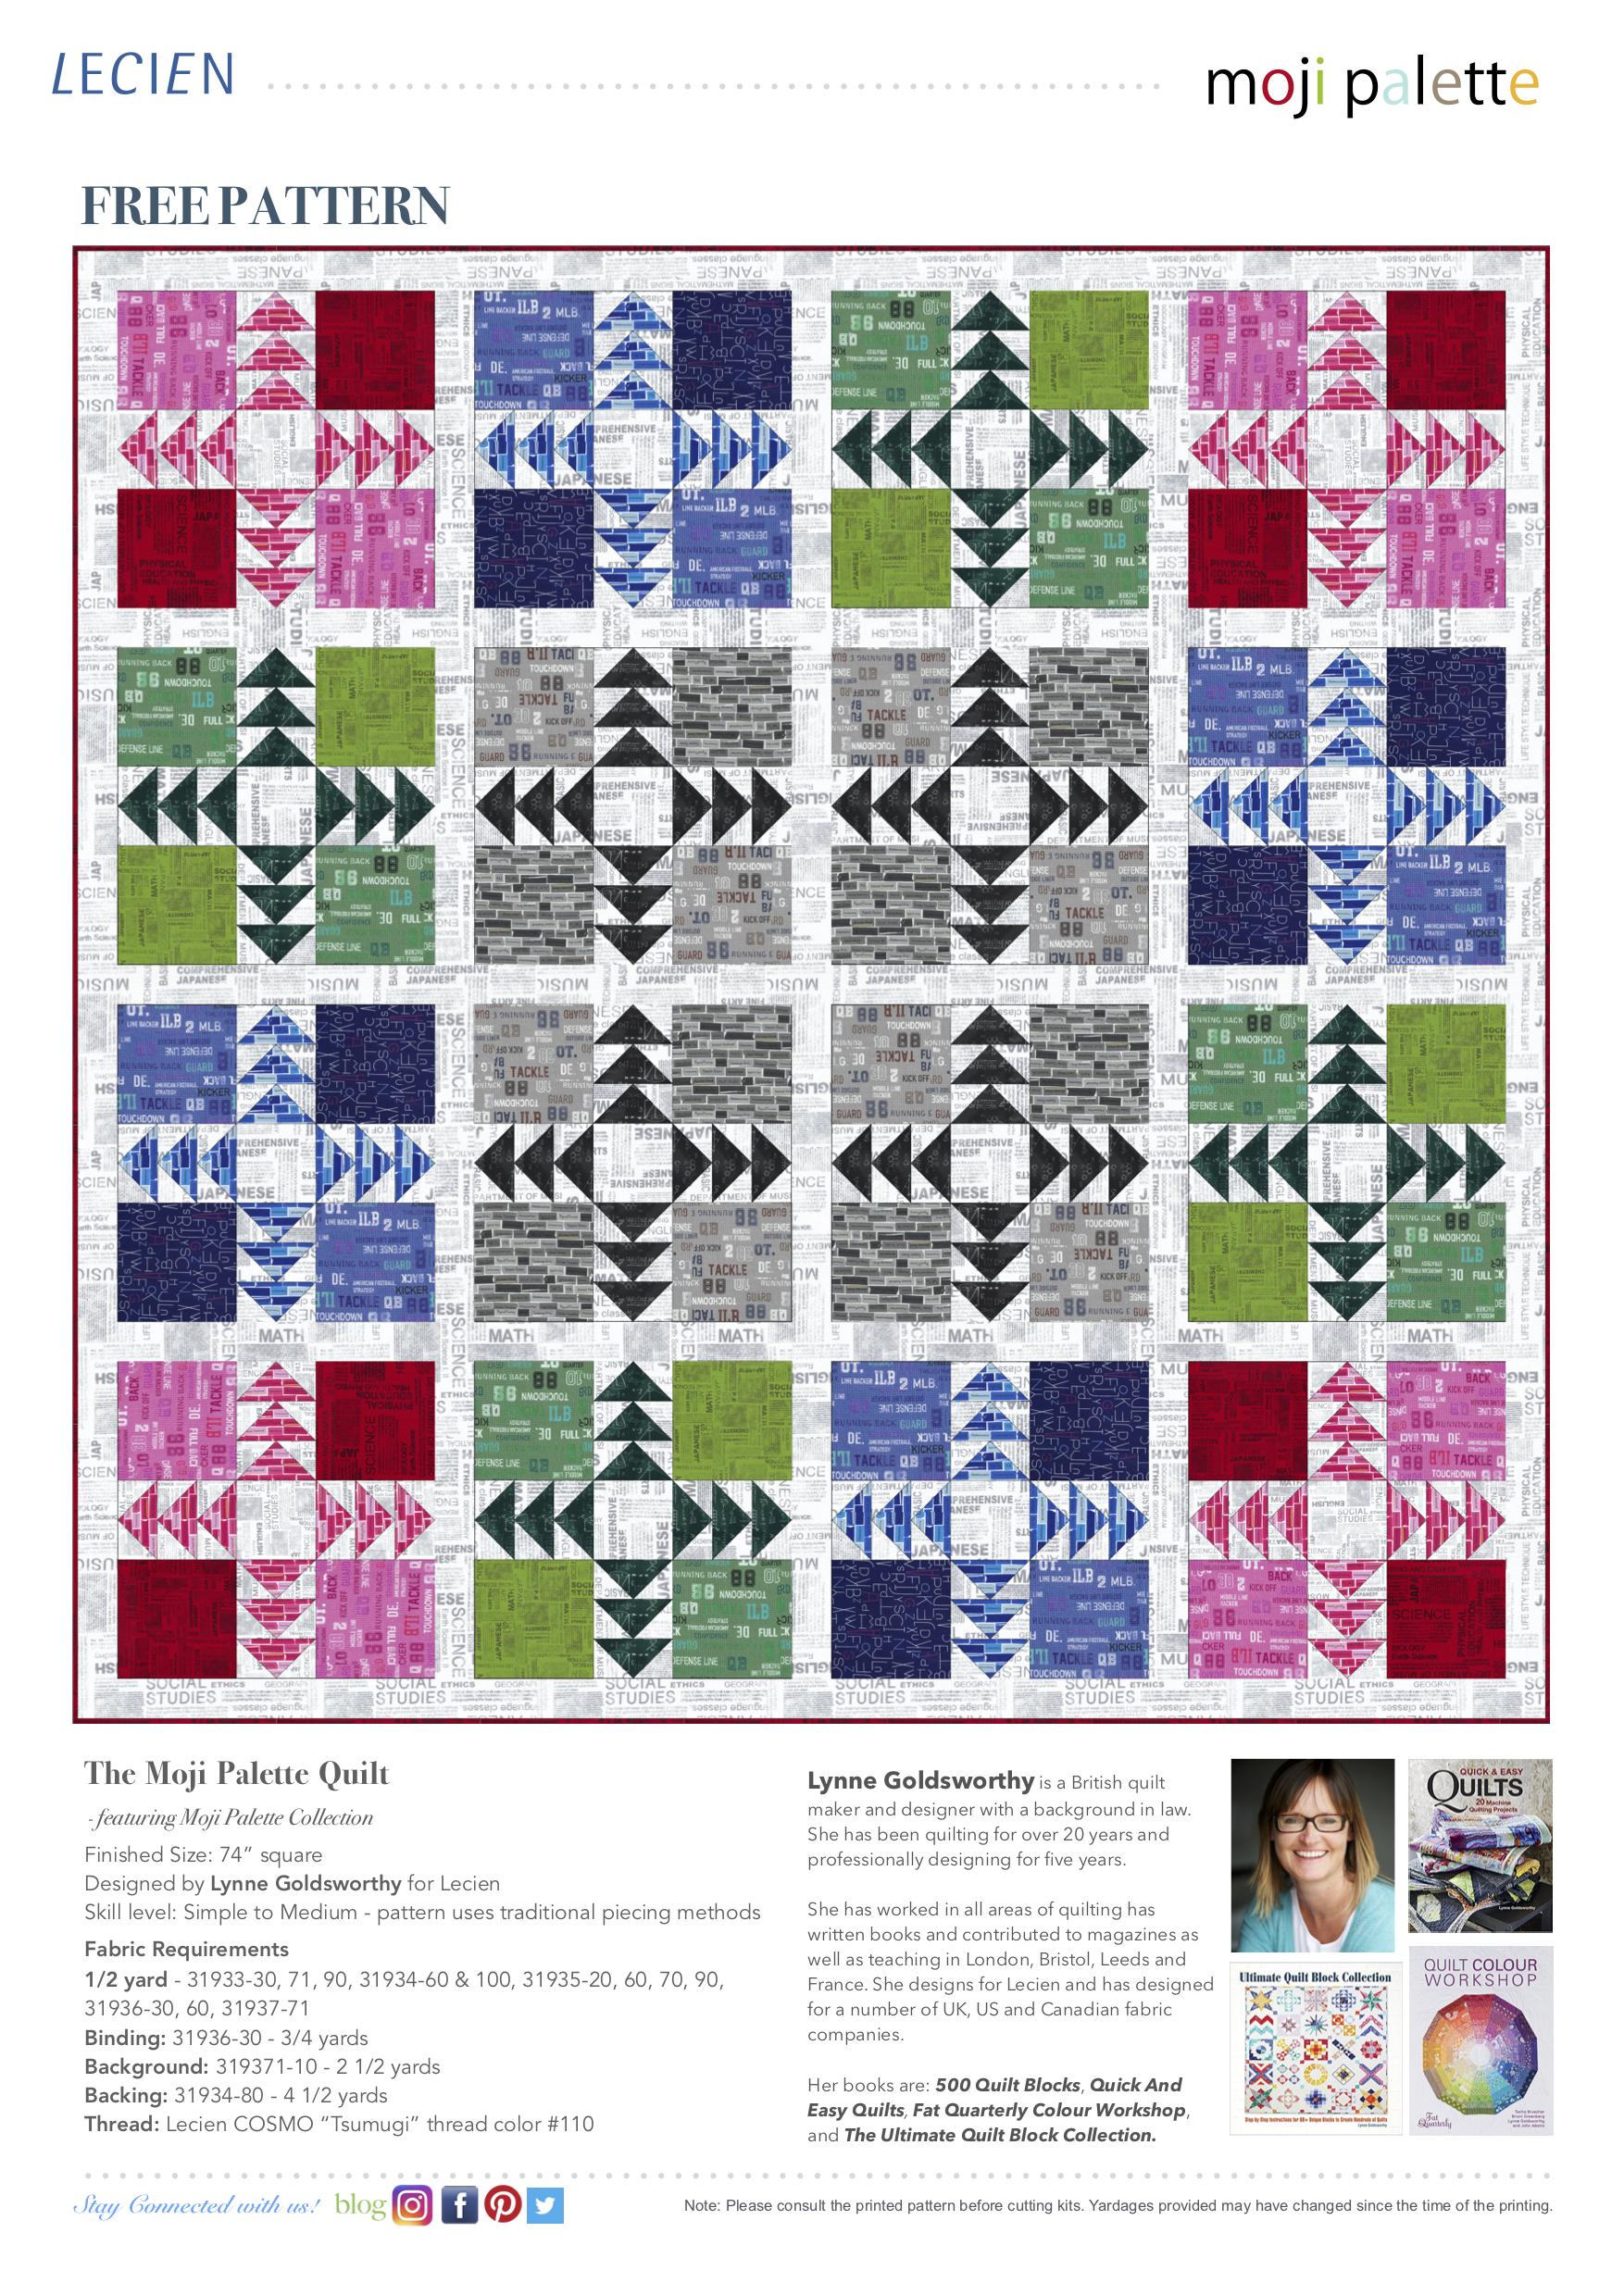 The Moji Palette Quilt